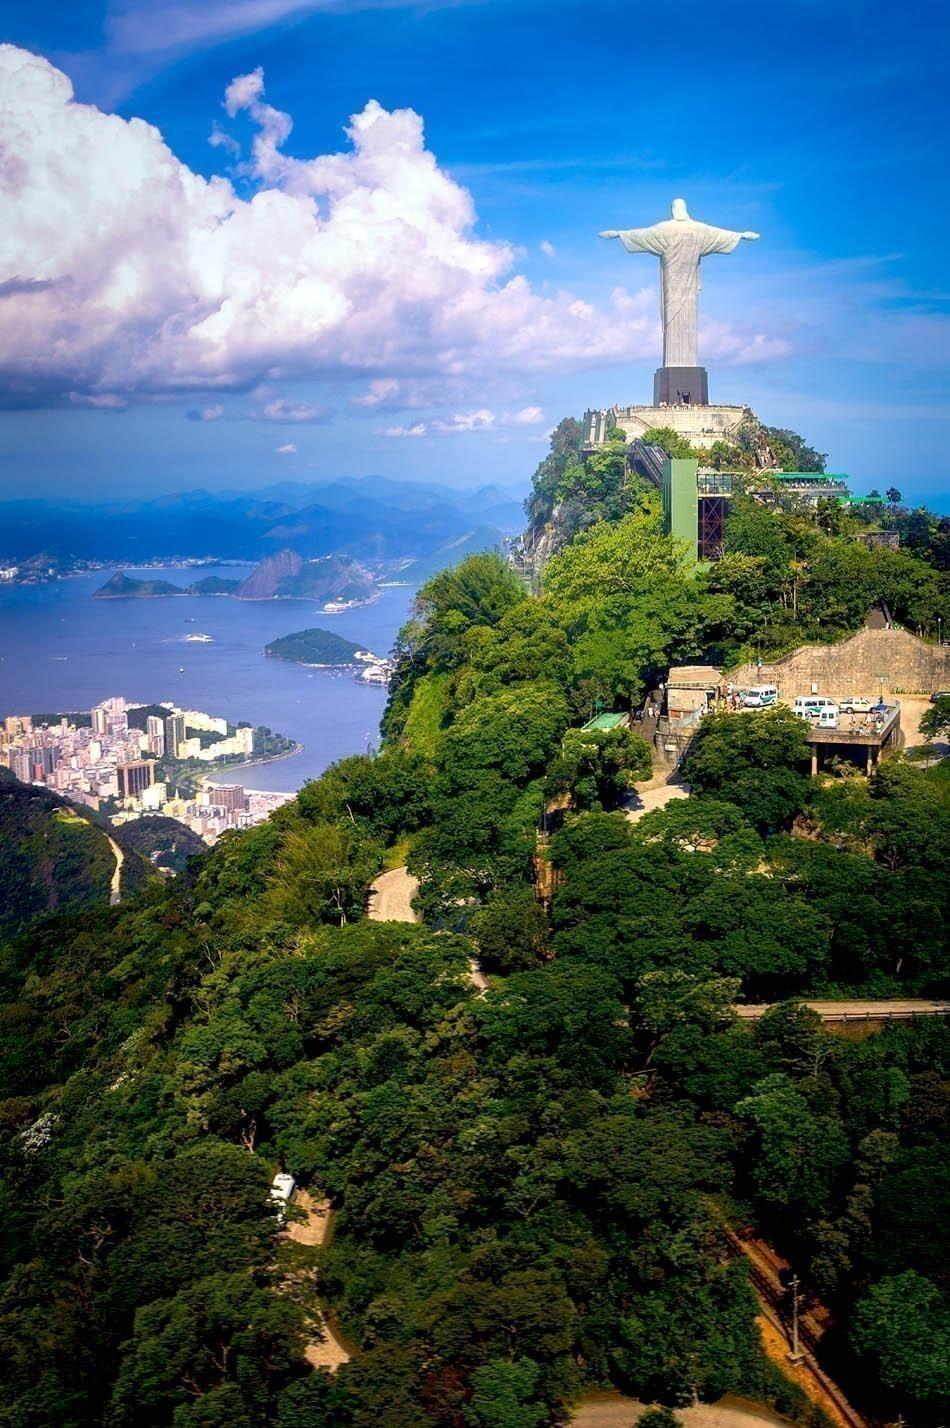 Christ the Redeemer statue on the top of a mountain, Rio De Janeiro | Brazil Travel Guide